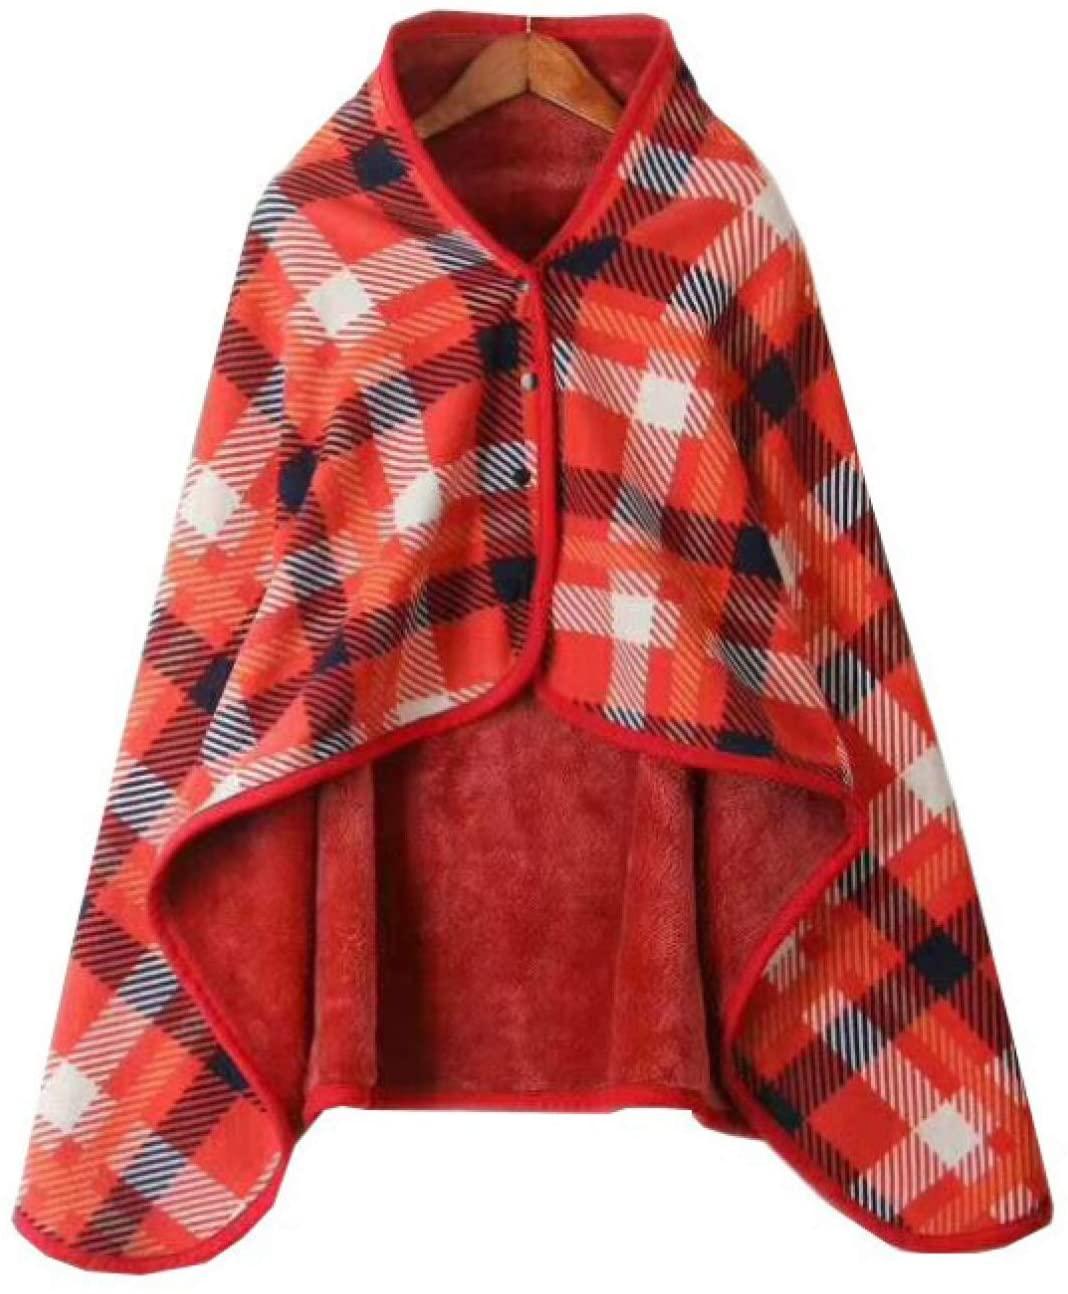 Fleece Wearable Blanket for Woman Soft Cozy Functional Lightweight Wearable Blanket Hoodie Elegant Blanket Shawl Blanket Sweatshirt